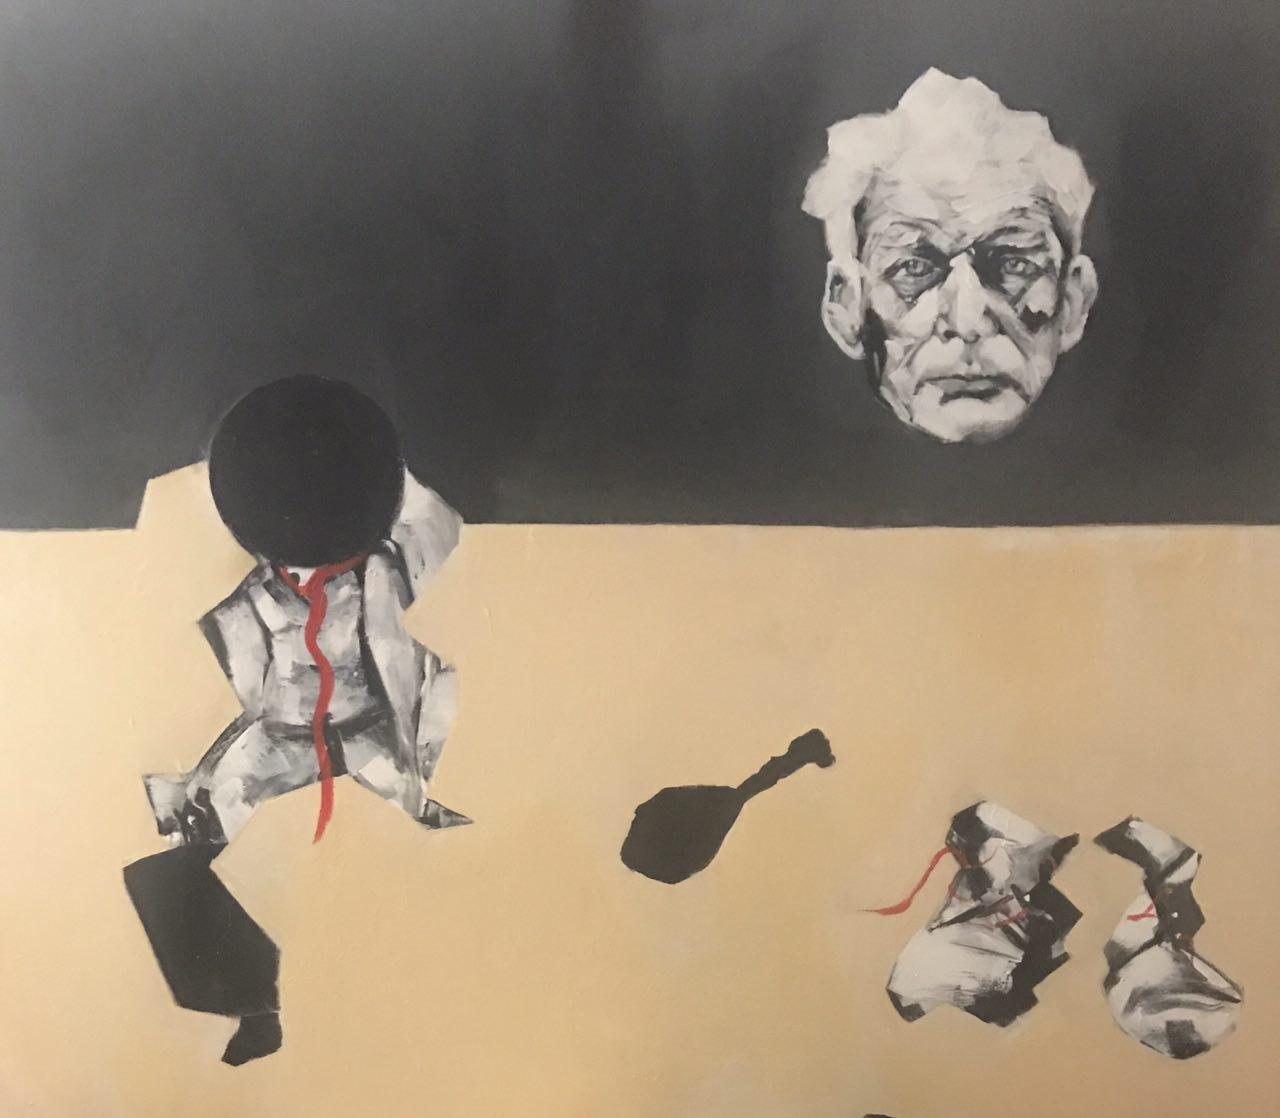 20496922-1-Anahita Mohebali-Waiting for Godot-Acrylic Painting on Canvas-47x39in-2017-USD500.jpg